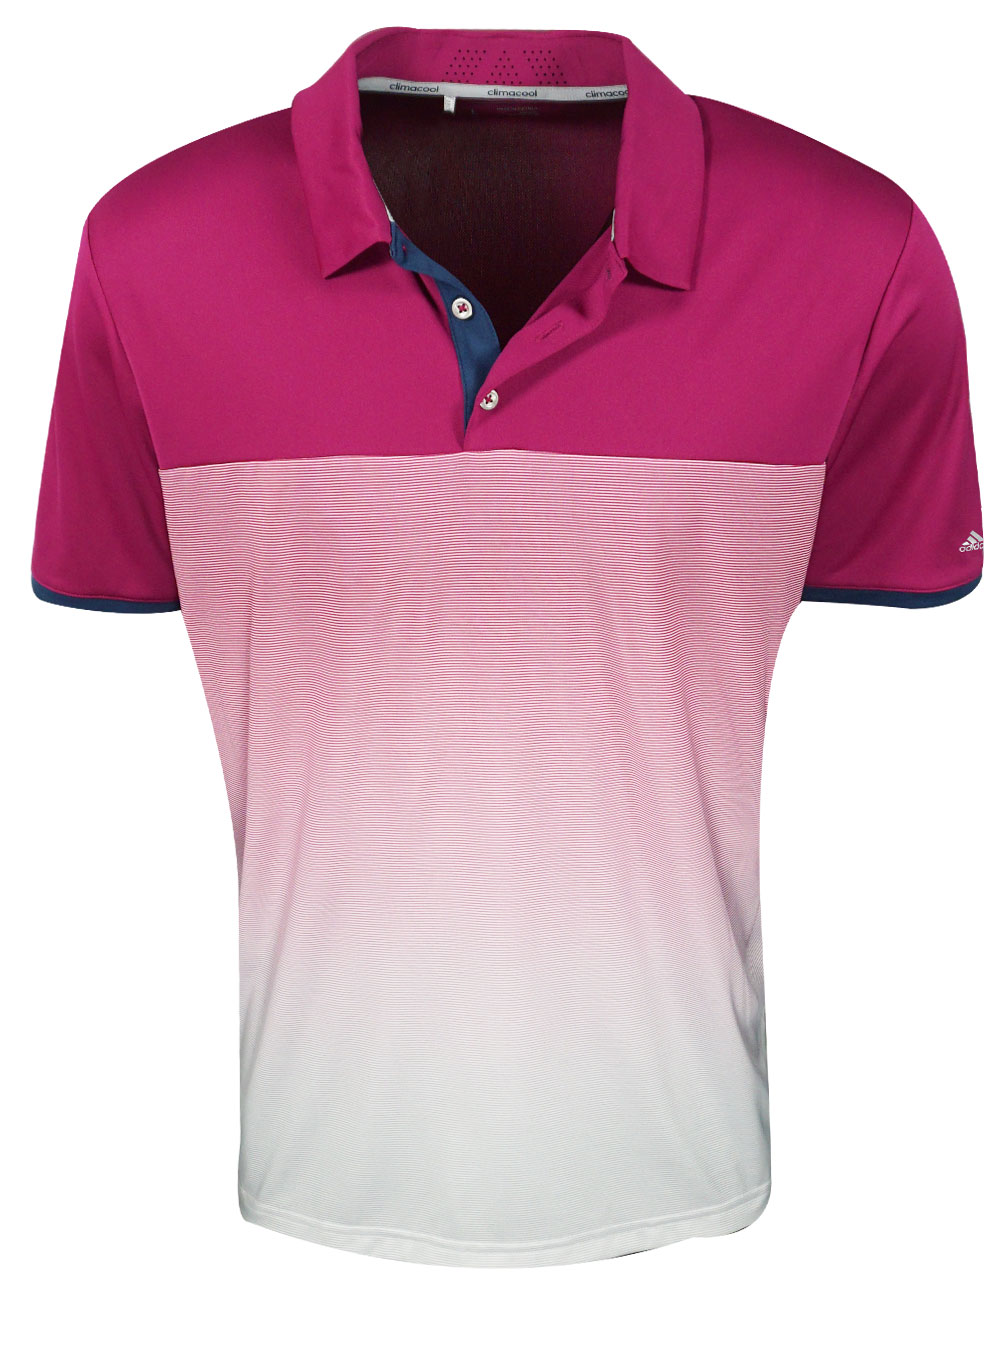 2020a002 Adidas Golf- Climachill Gradient Stripe Polo